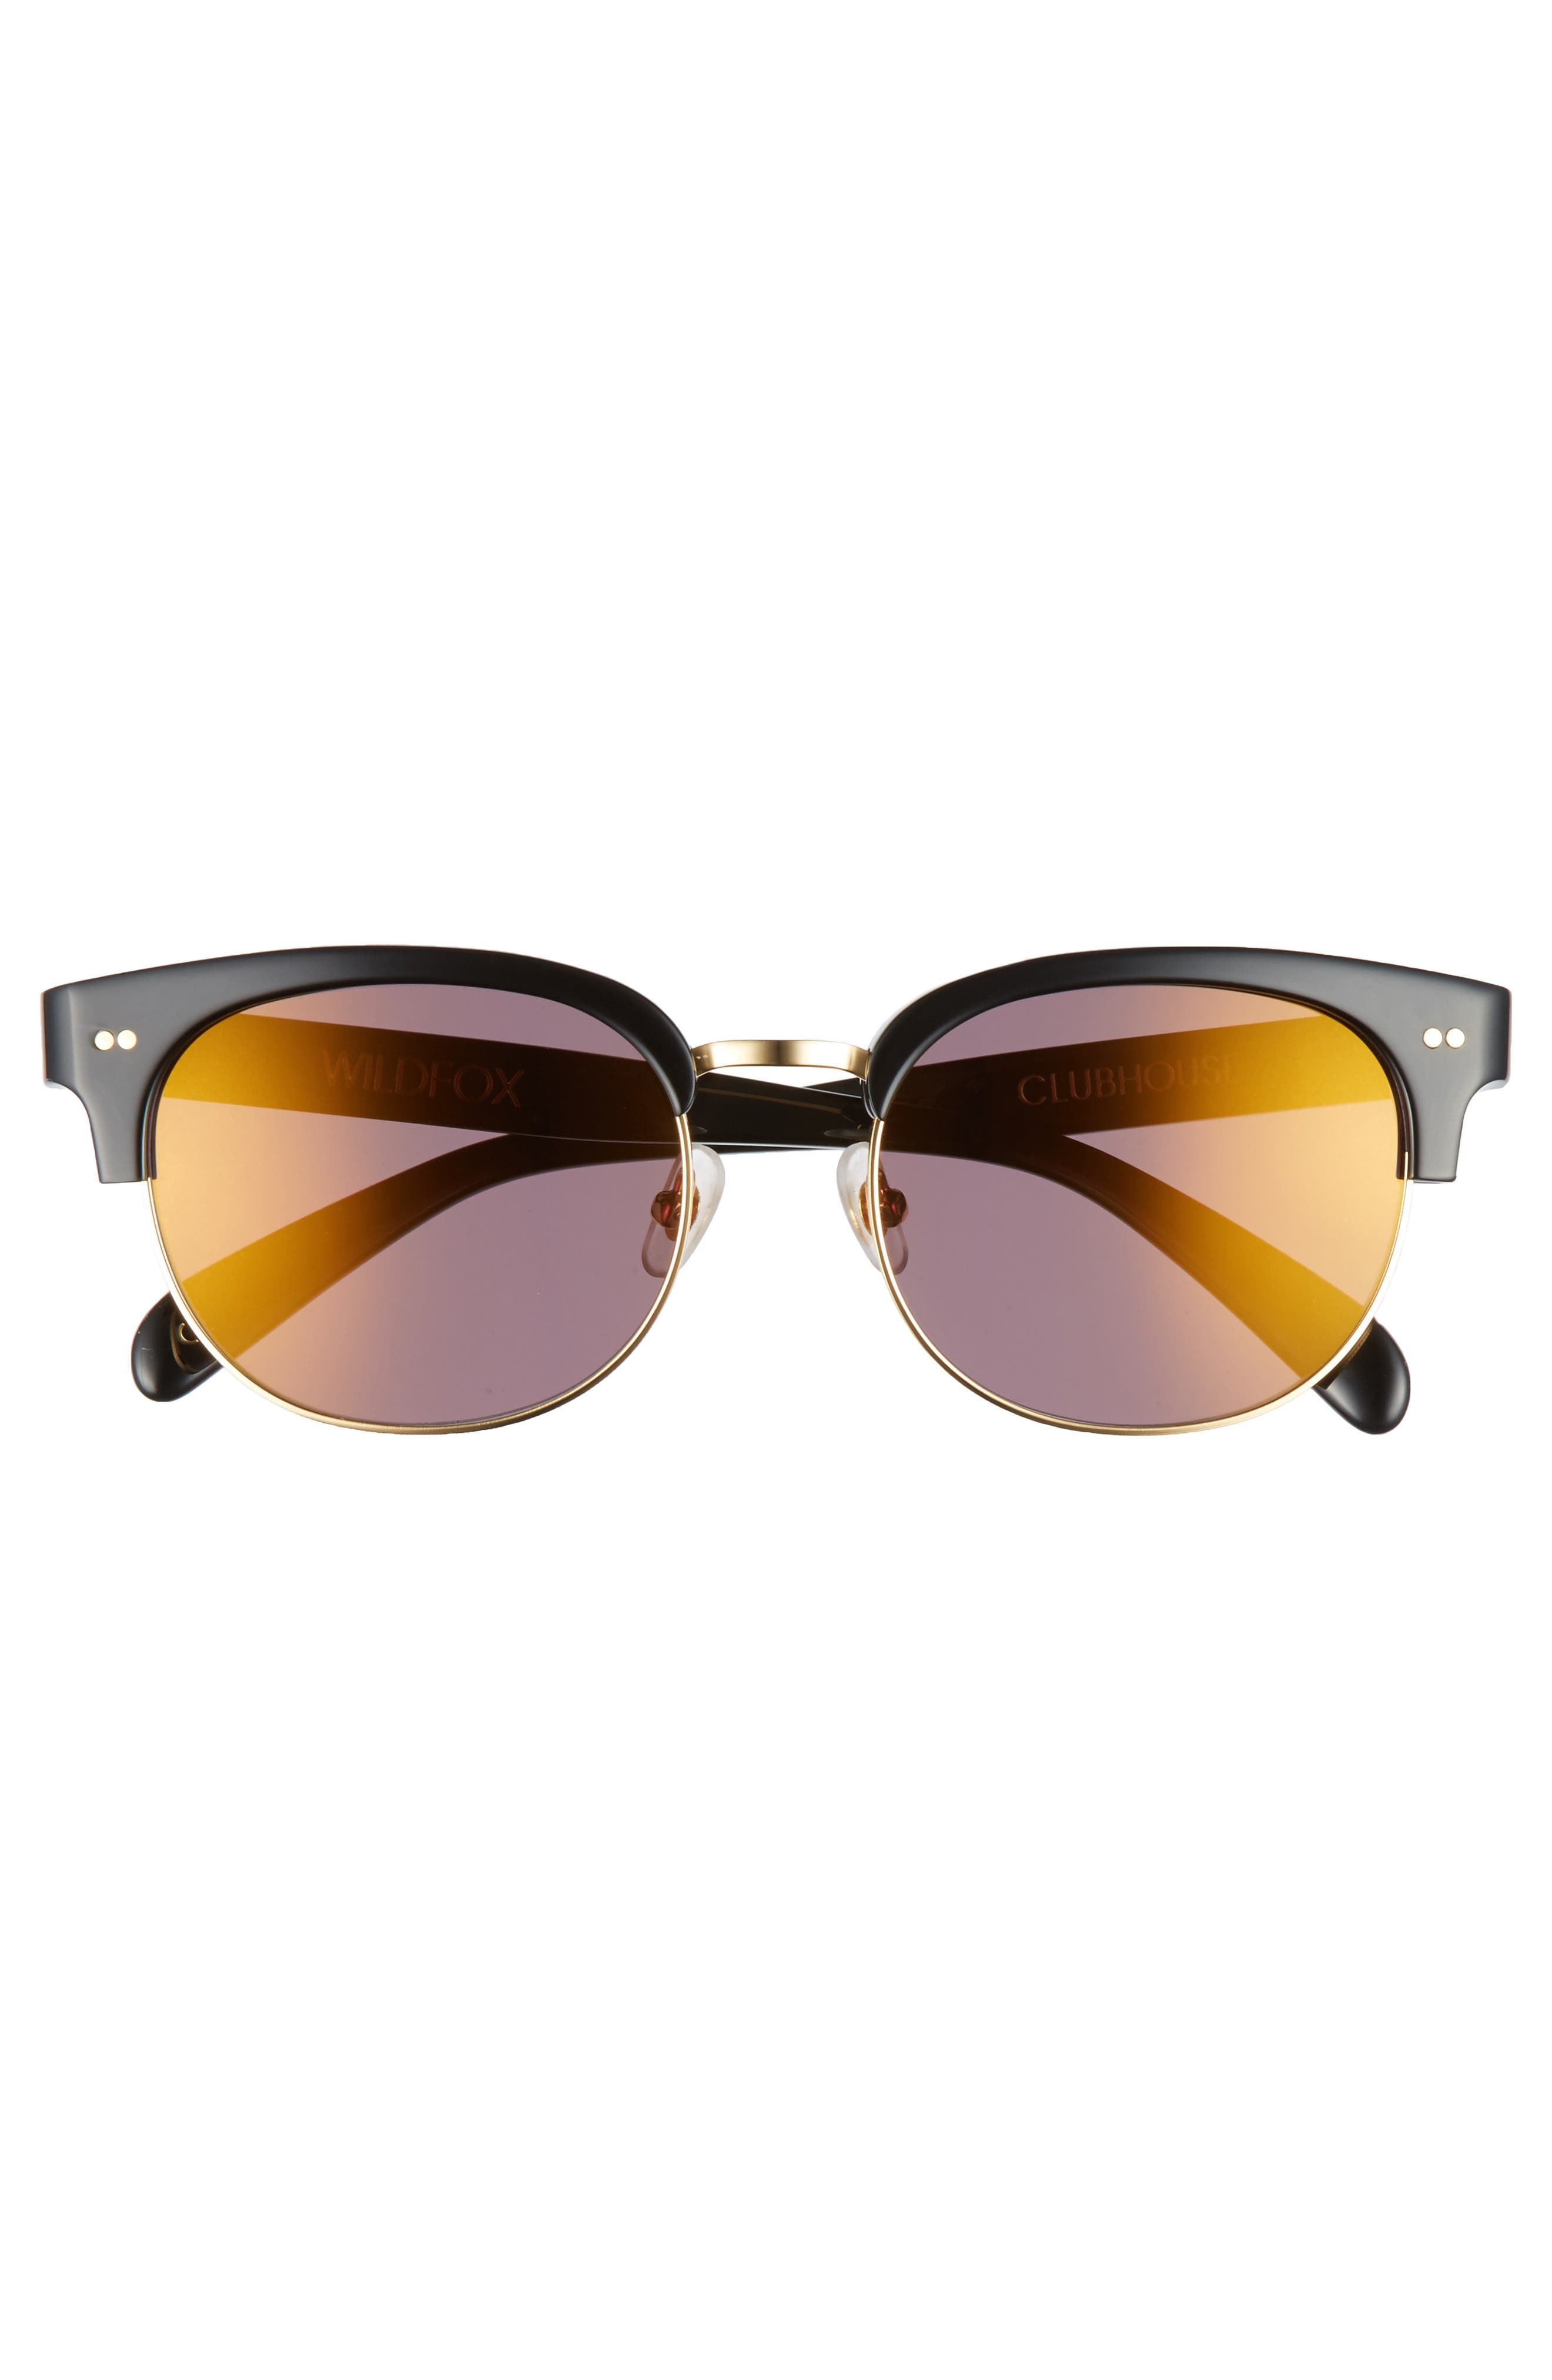 WILDFOX, Clubhouse 50mm Semi-Rimless Sunglasses, Alternate thumbnail 3, color, BLACK/ GOLD